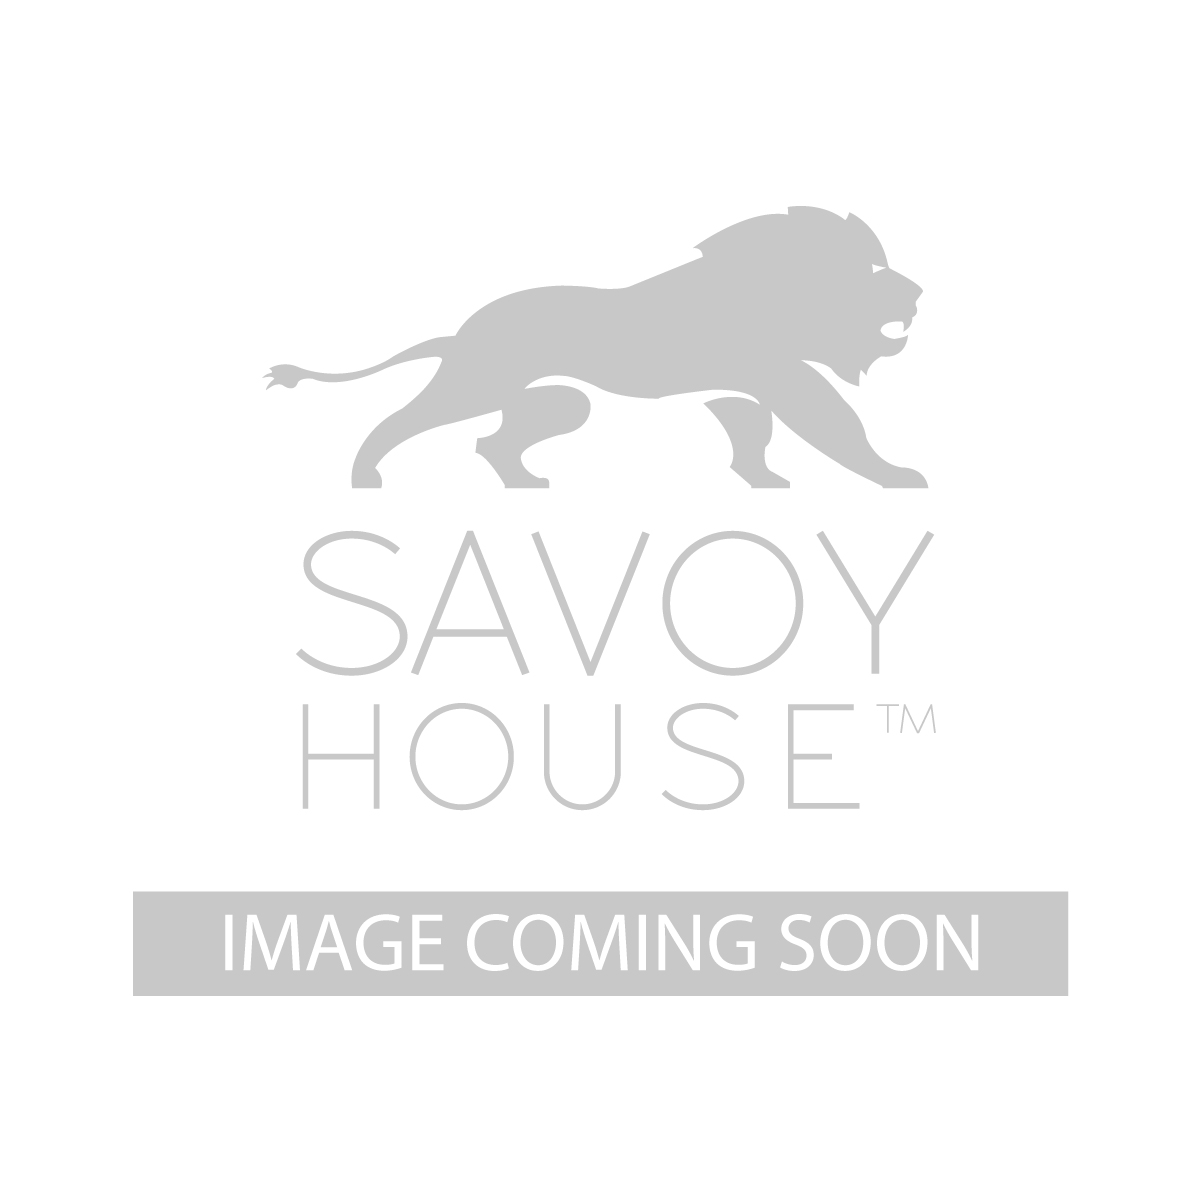 8 9130 4 13 drake 4 light bath bar by savoy house drake 4 light bath bar aloadofball Gallery